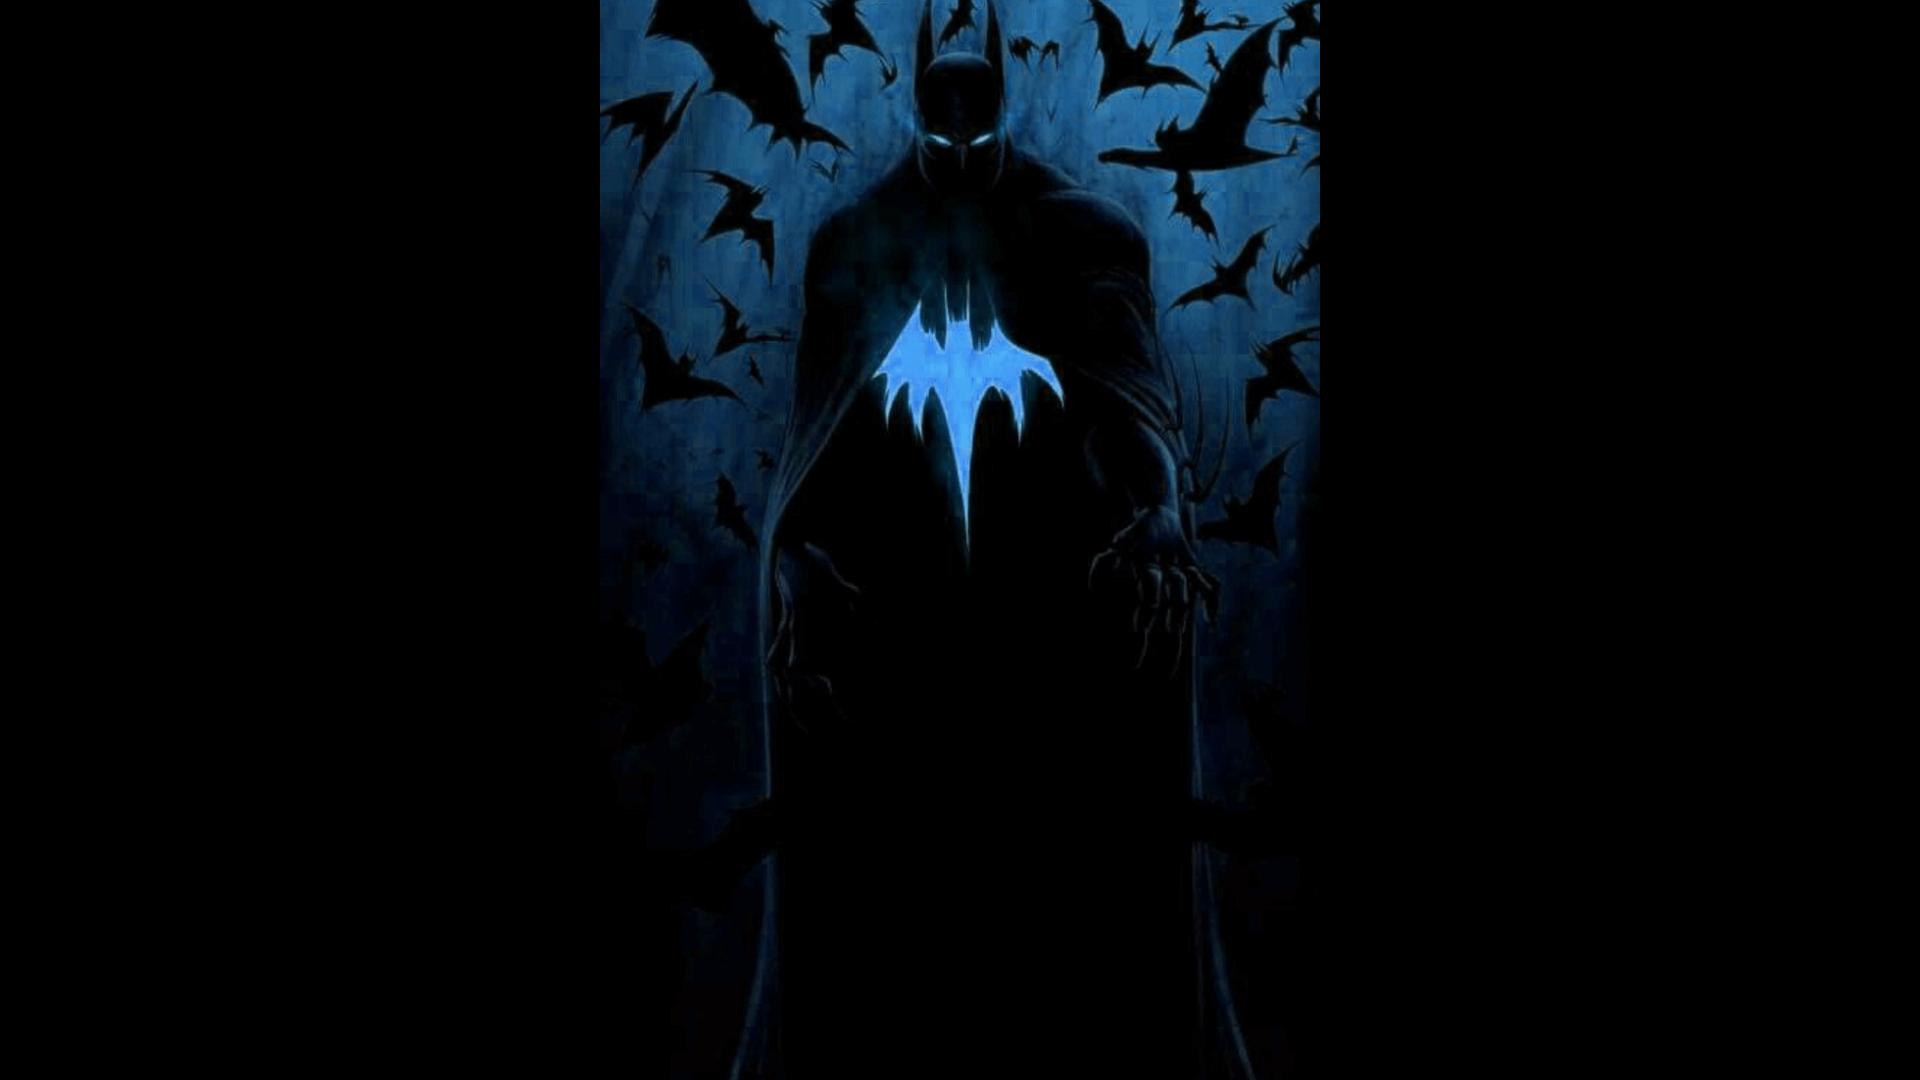 Cuál es tu película de Batman favorita?